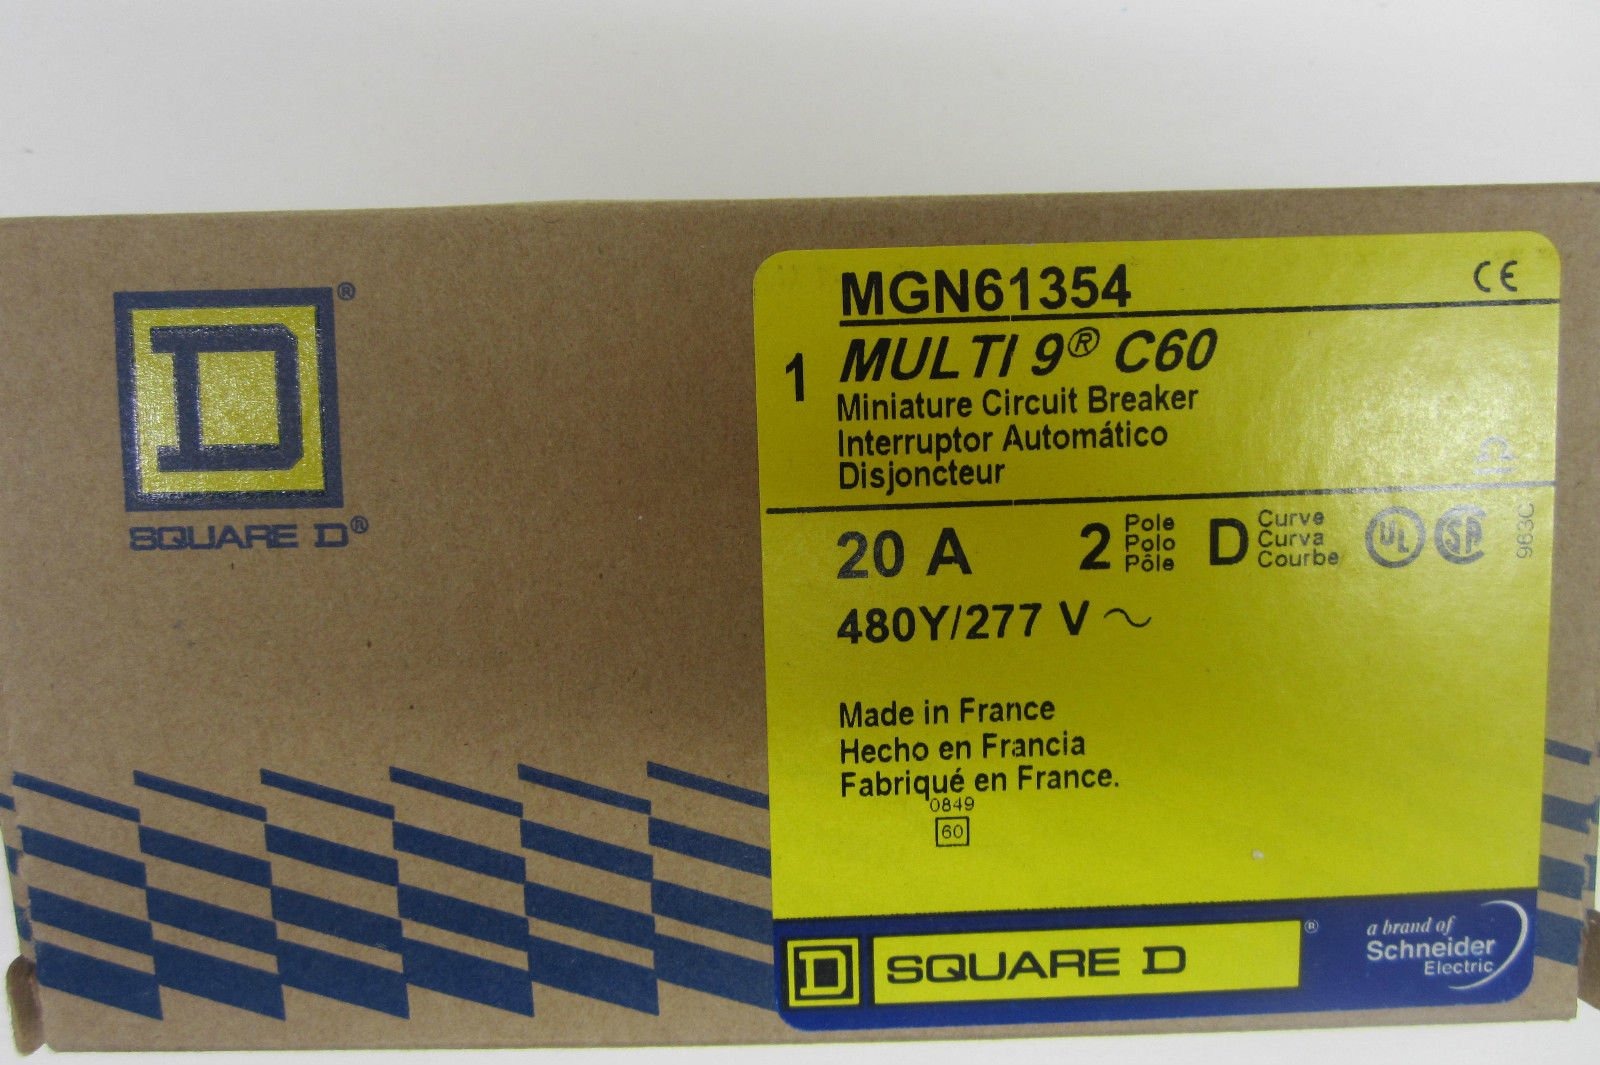 NEW SQUARE D MGN61354 CIRCUIT BREAKER